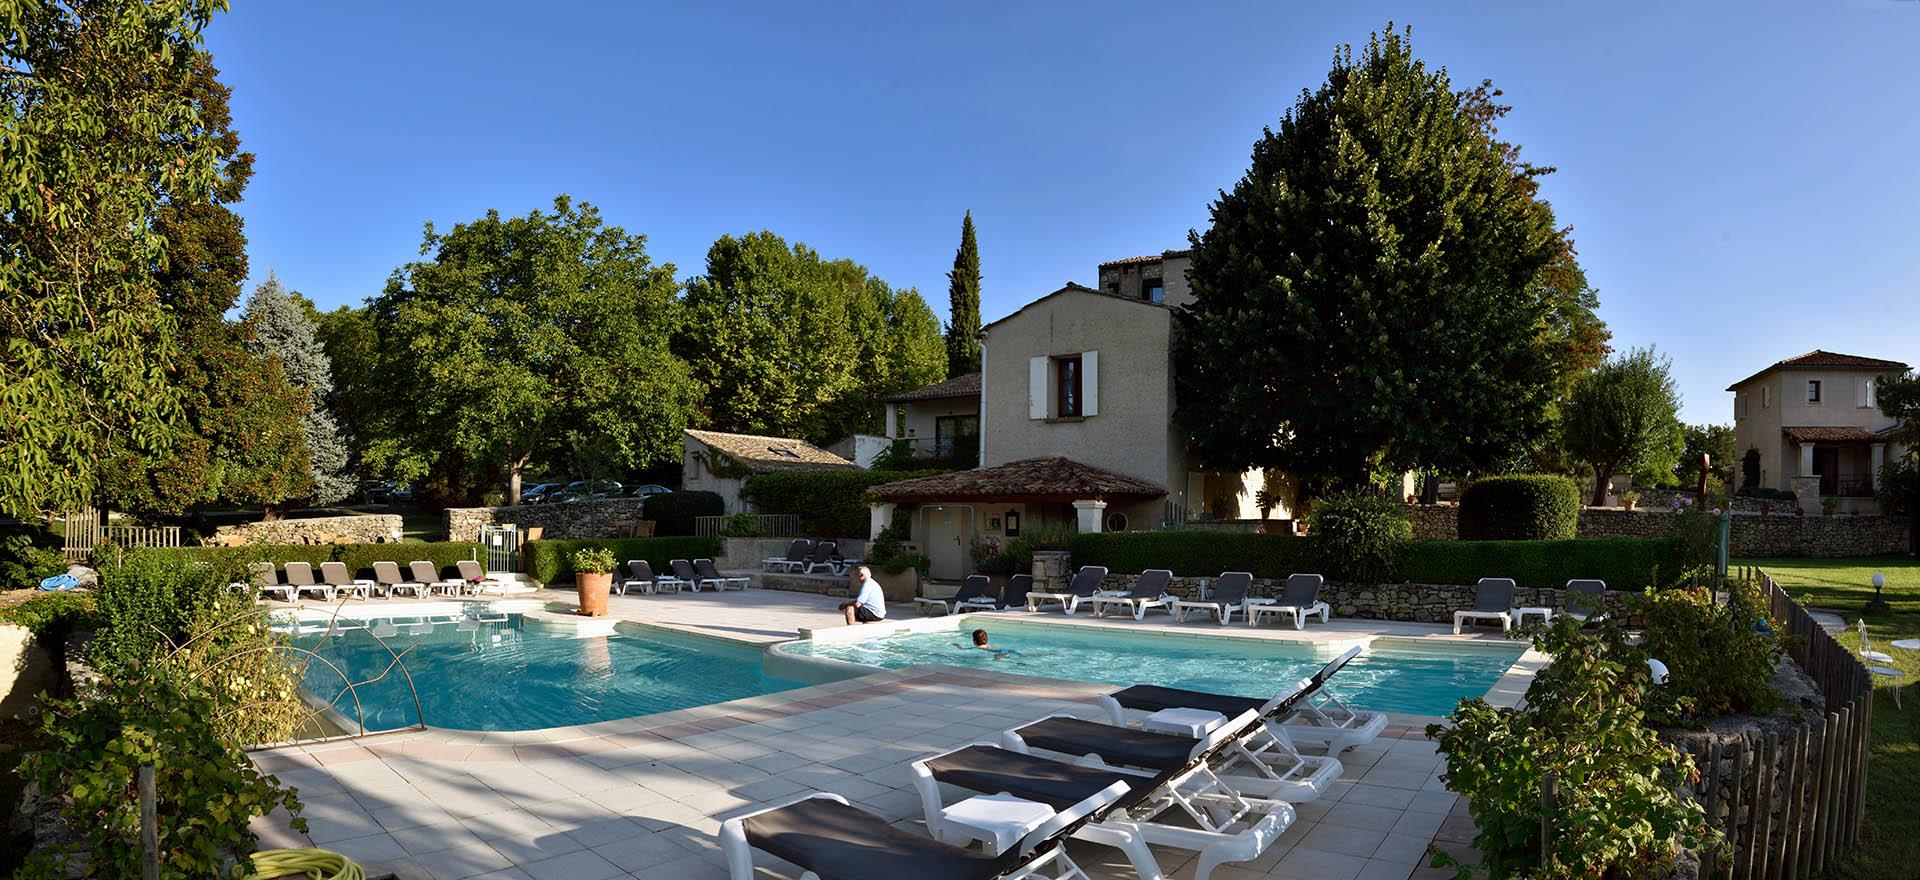 10 piscine